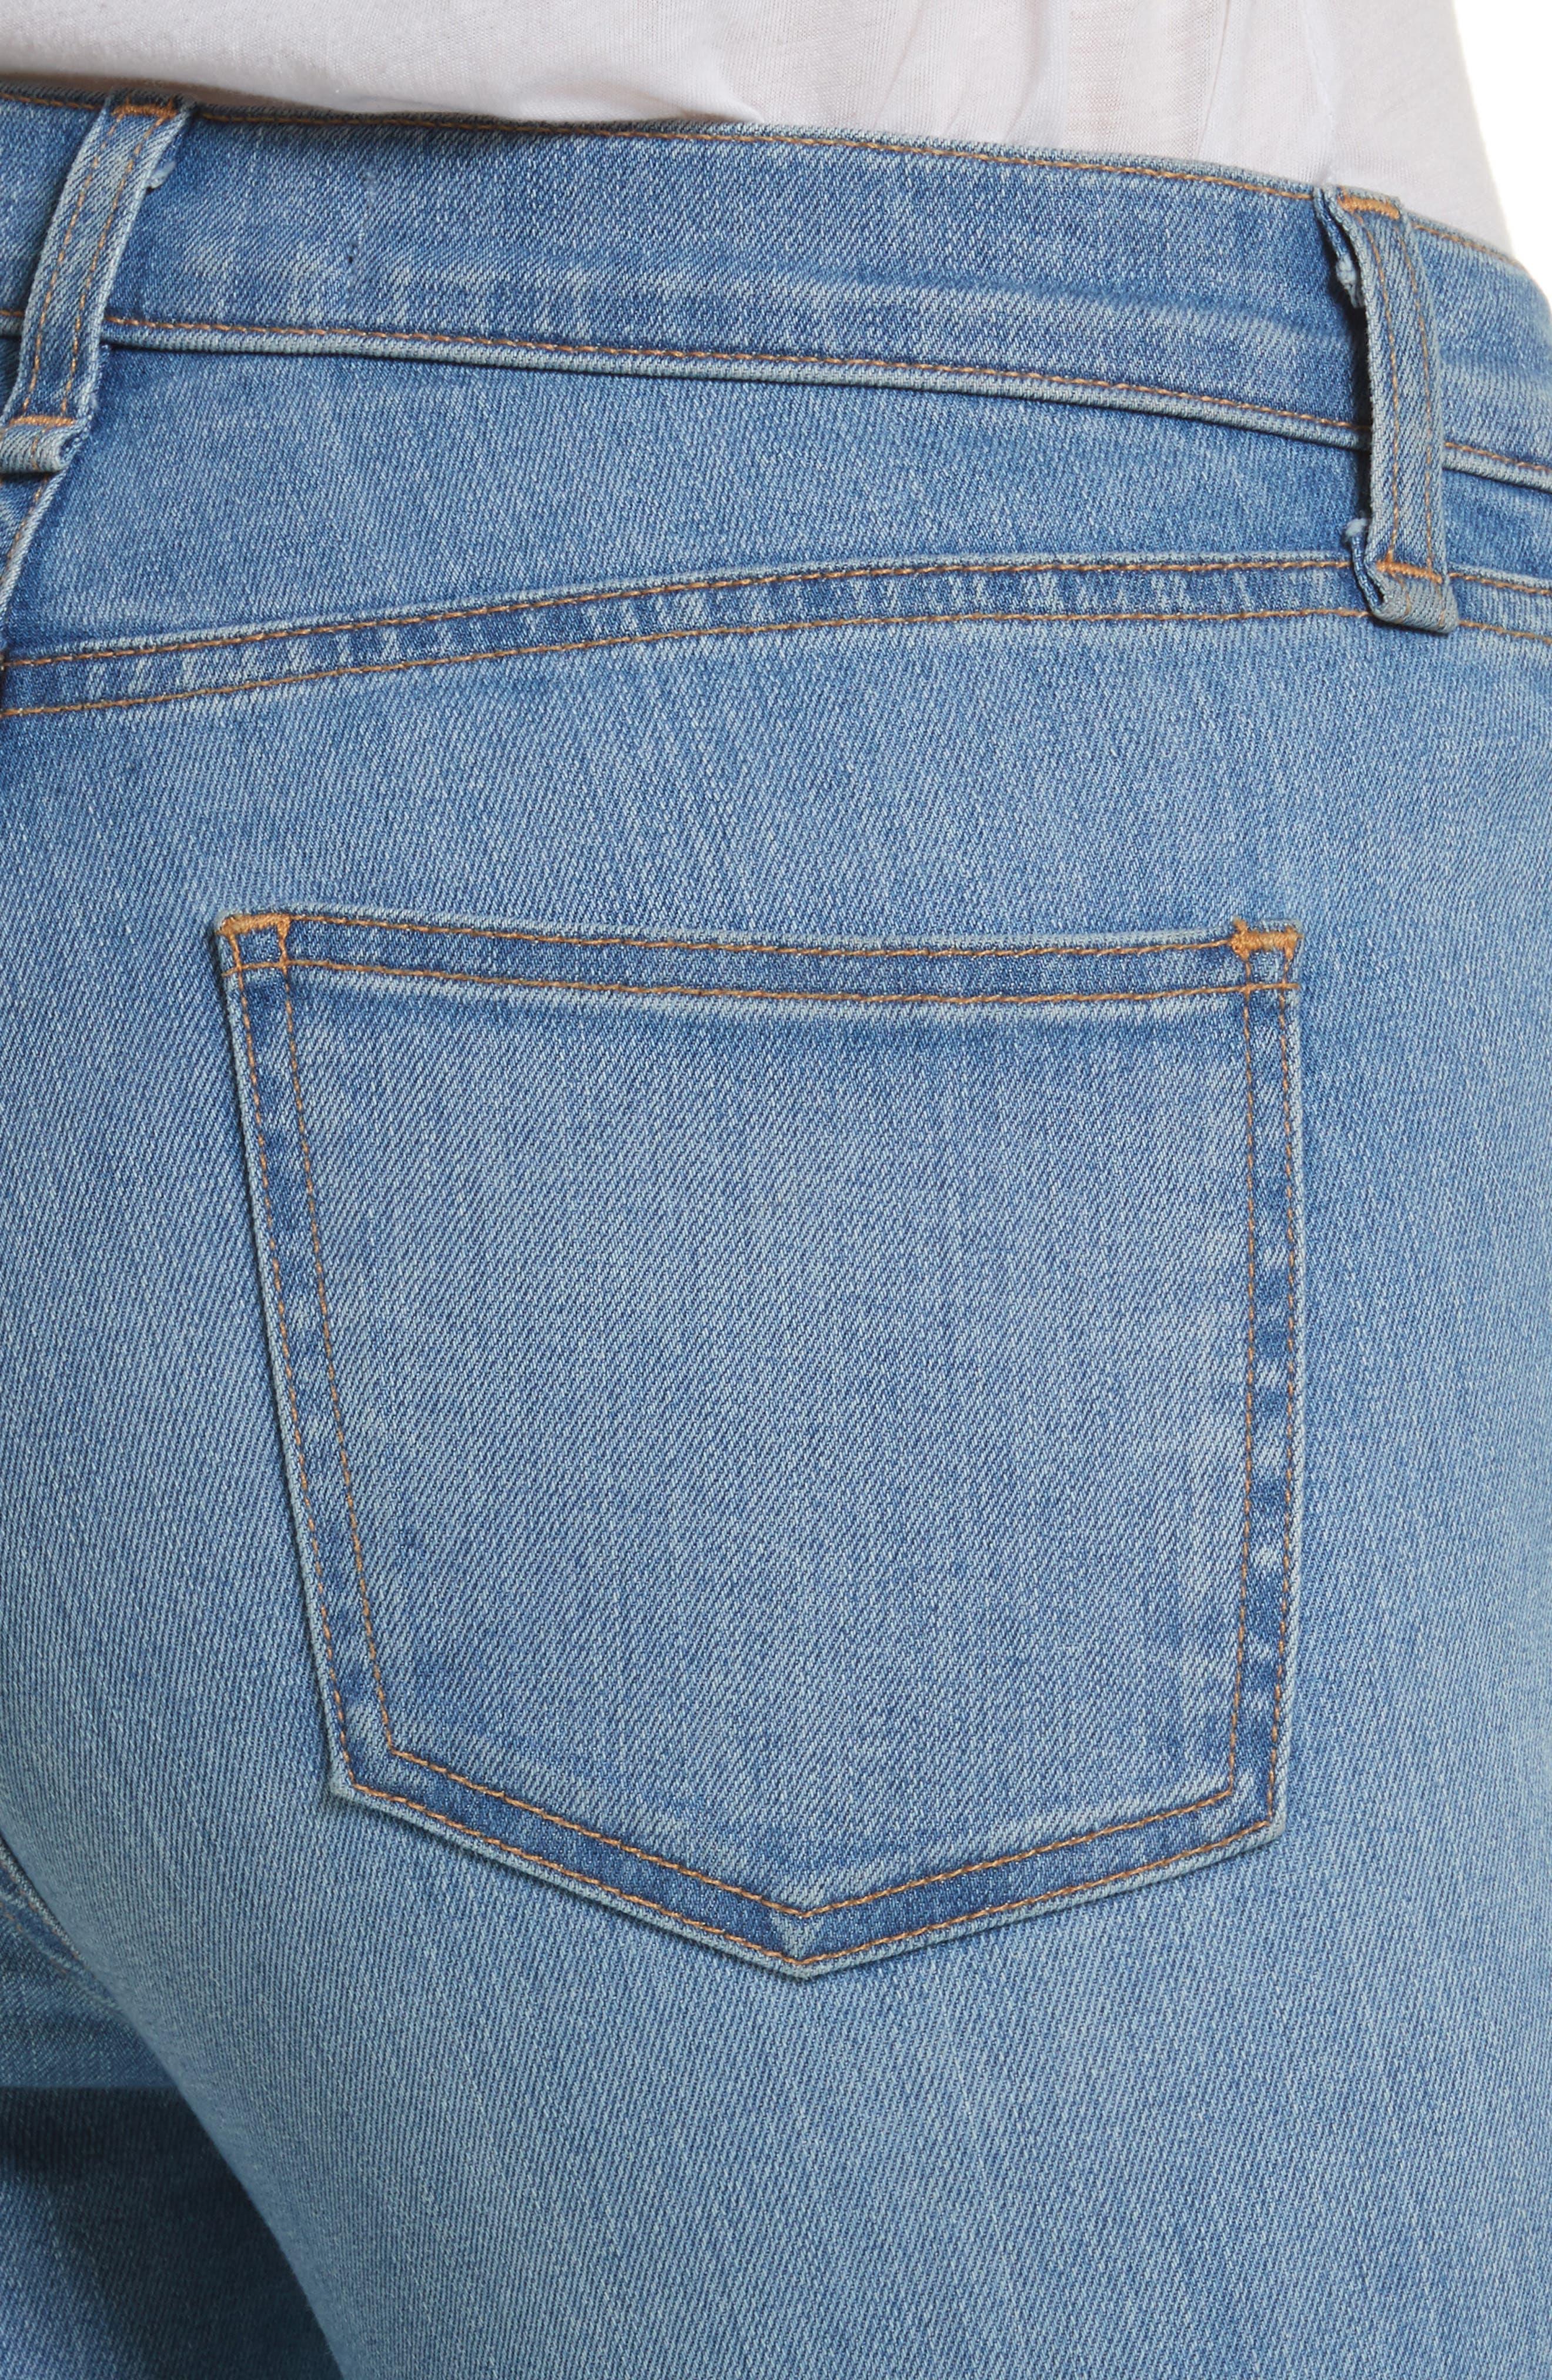 Debbie High Waist Fray Hem Jeans,                             Alternate thumbnail 4, color,